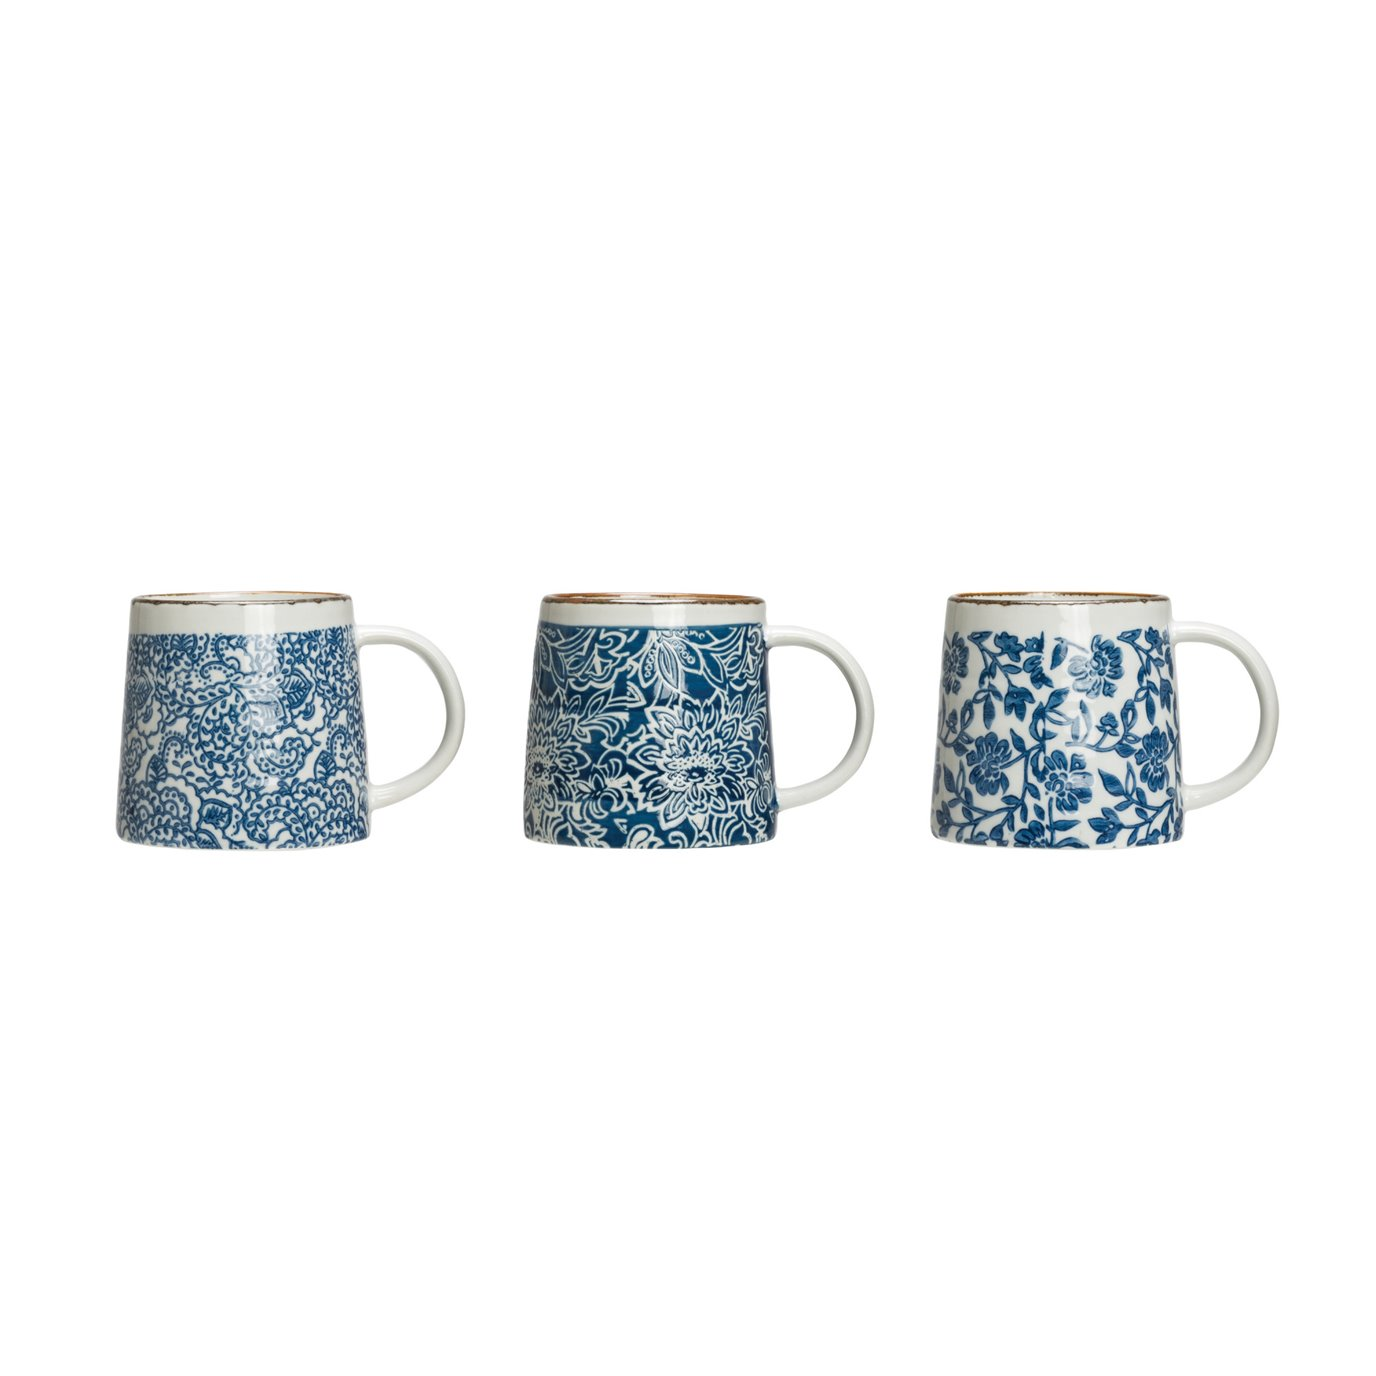 Blue & White Hand-Stamped Stoneware Mug with Gold Rim (Set of 3 Patterns)